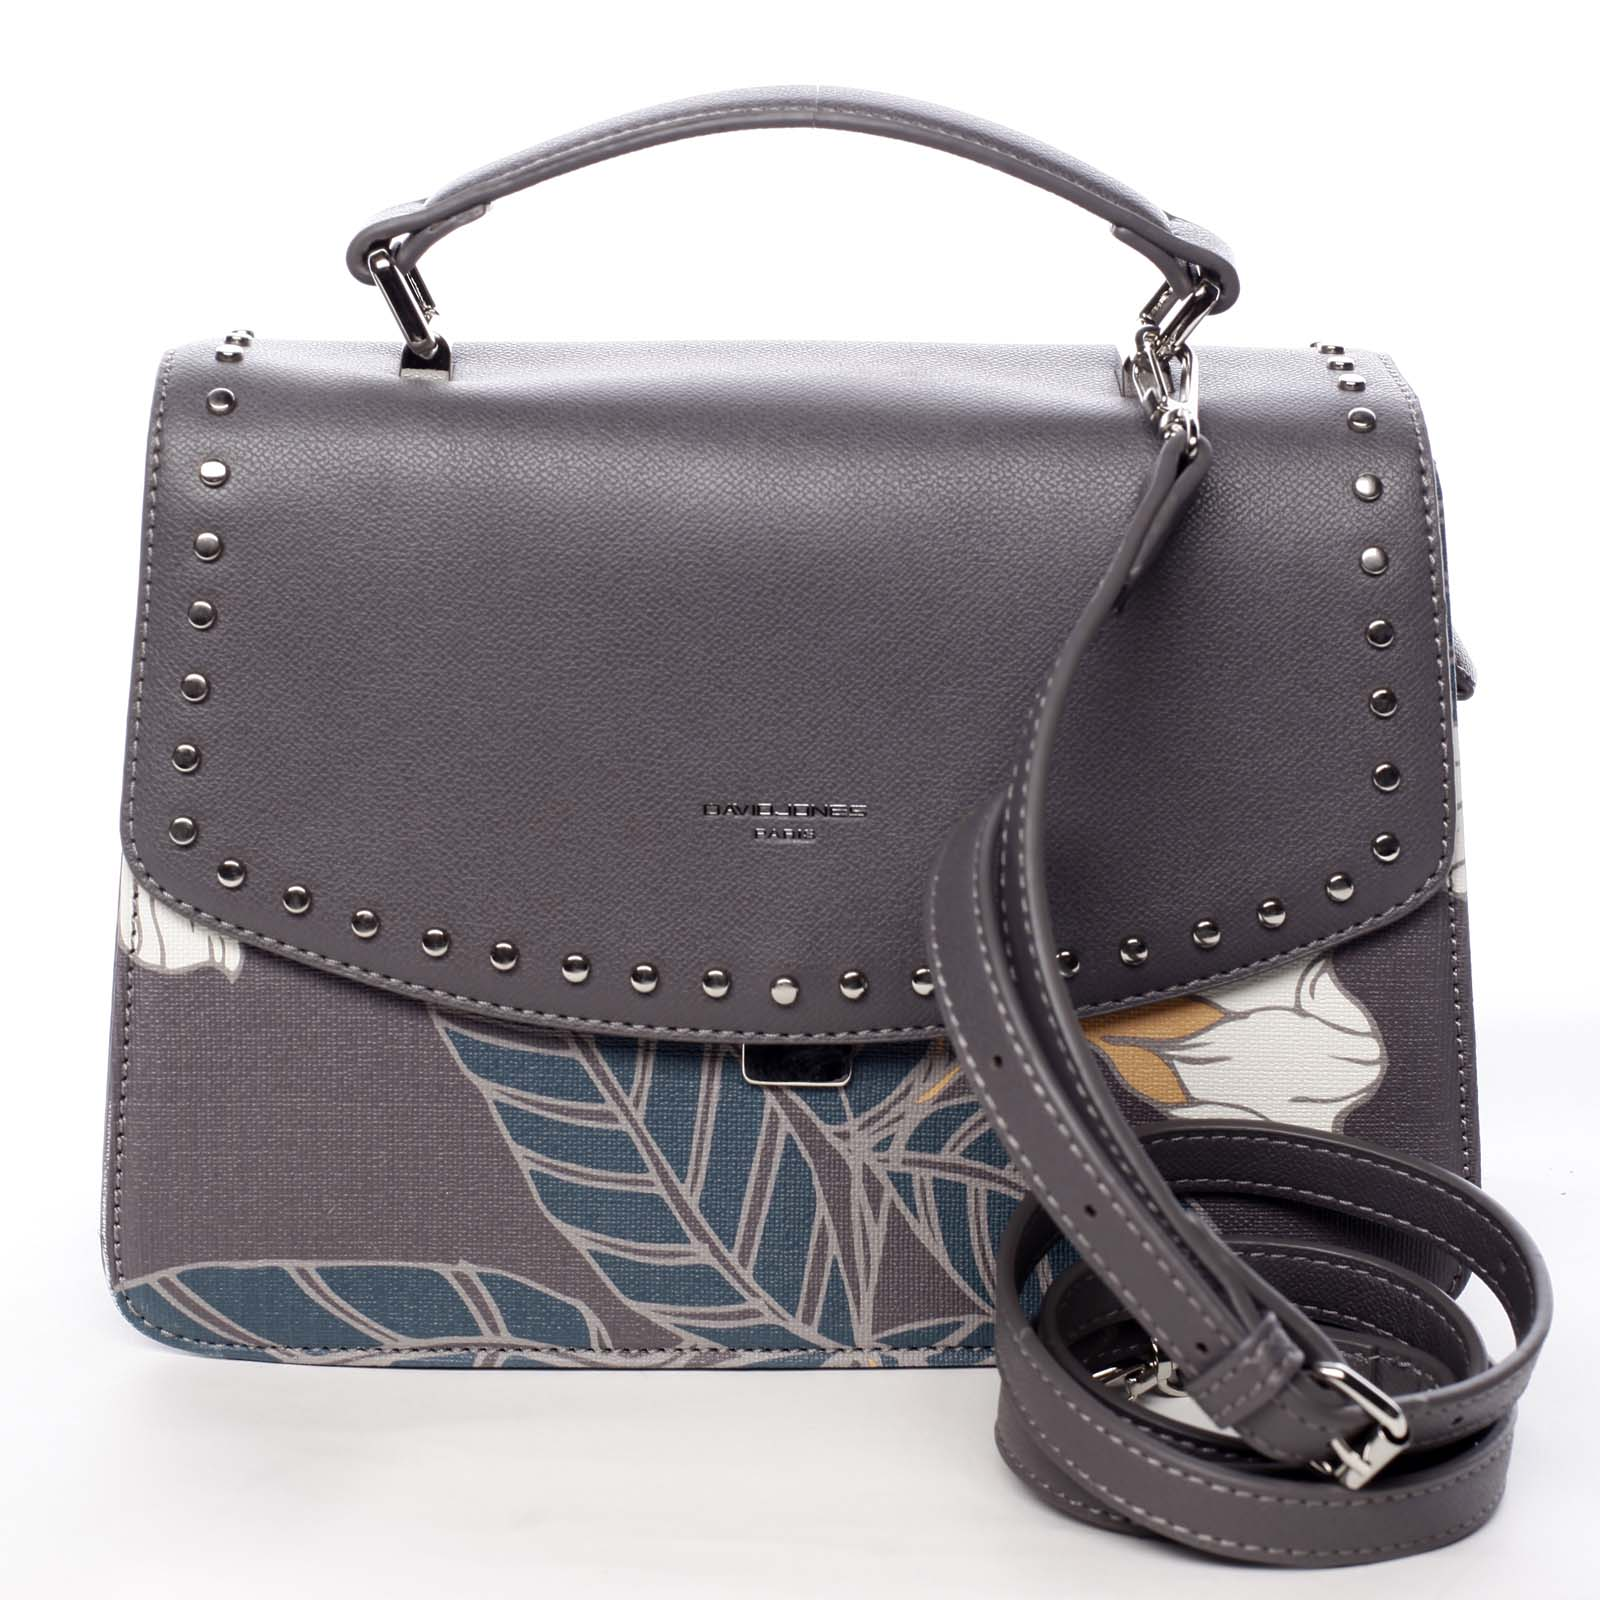 Dámská kabelka do ruky šedá - David Jones Floral